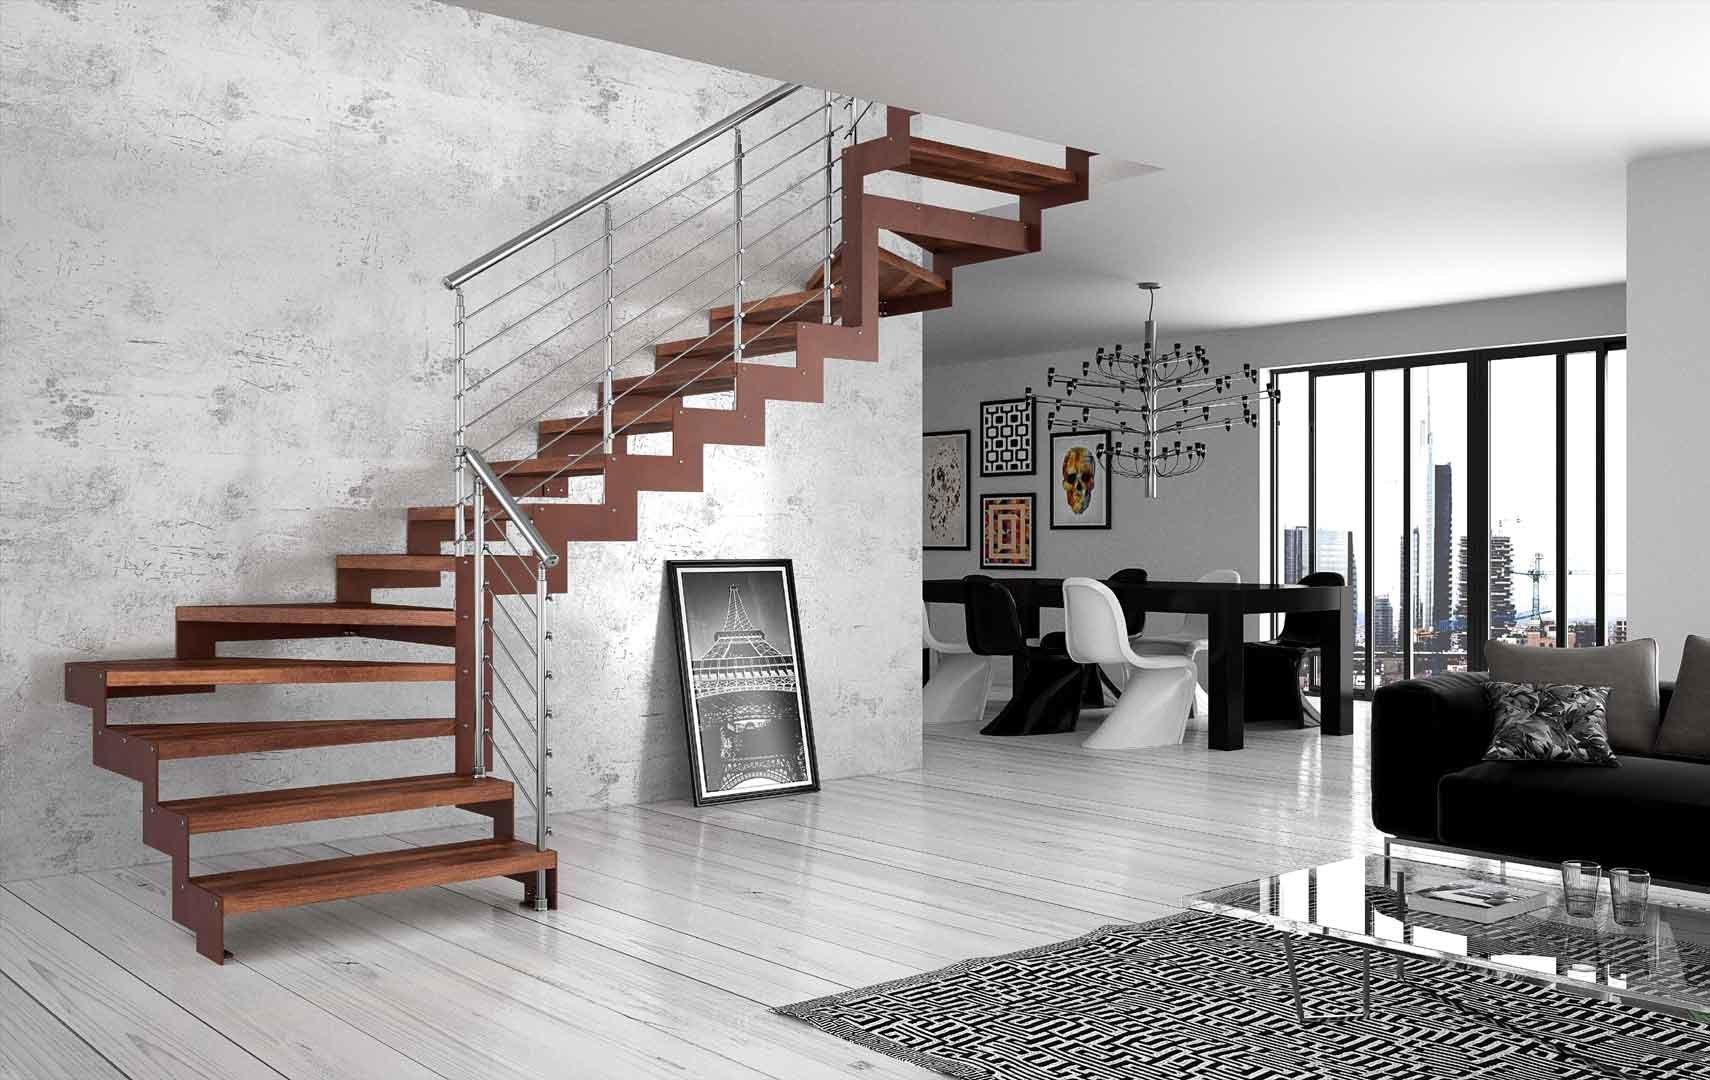 Stil_casa_belsito_cosenza_bbls_group_paviment_rivestimenti_arredo_scale_1